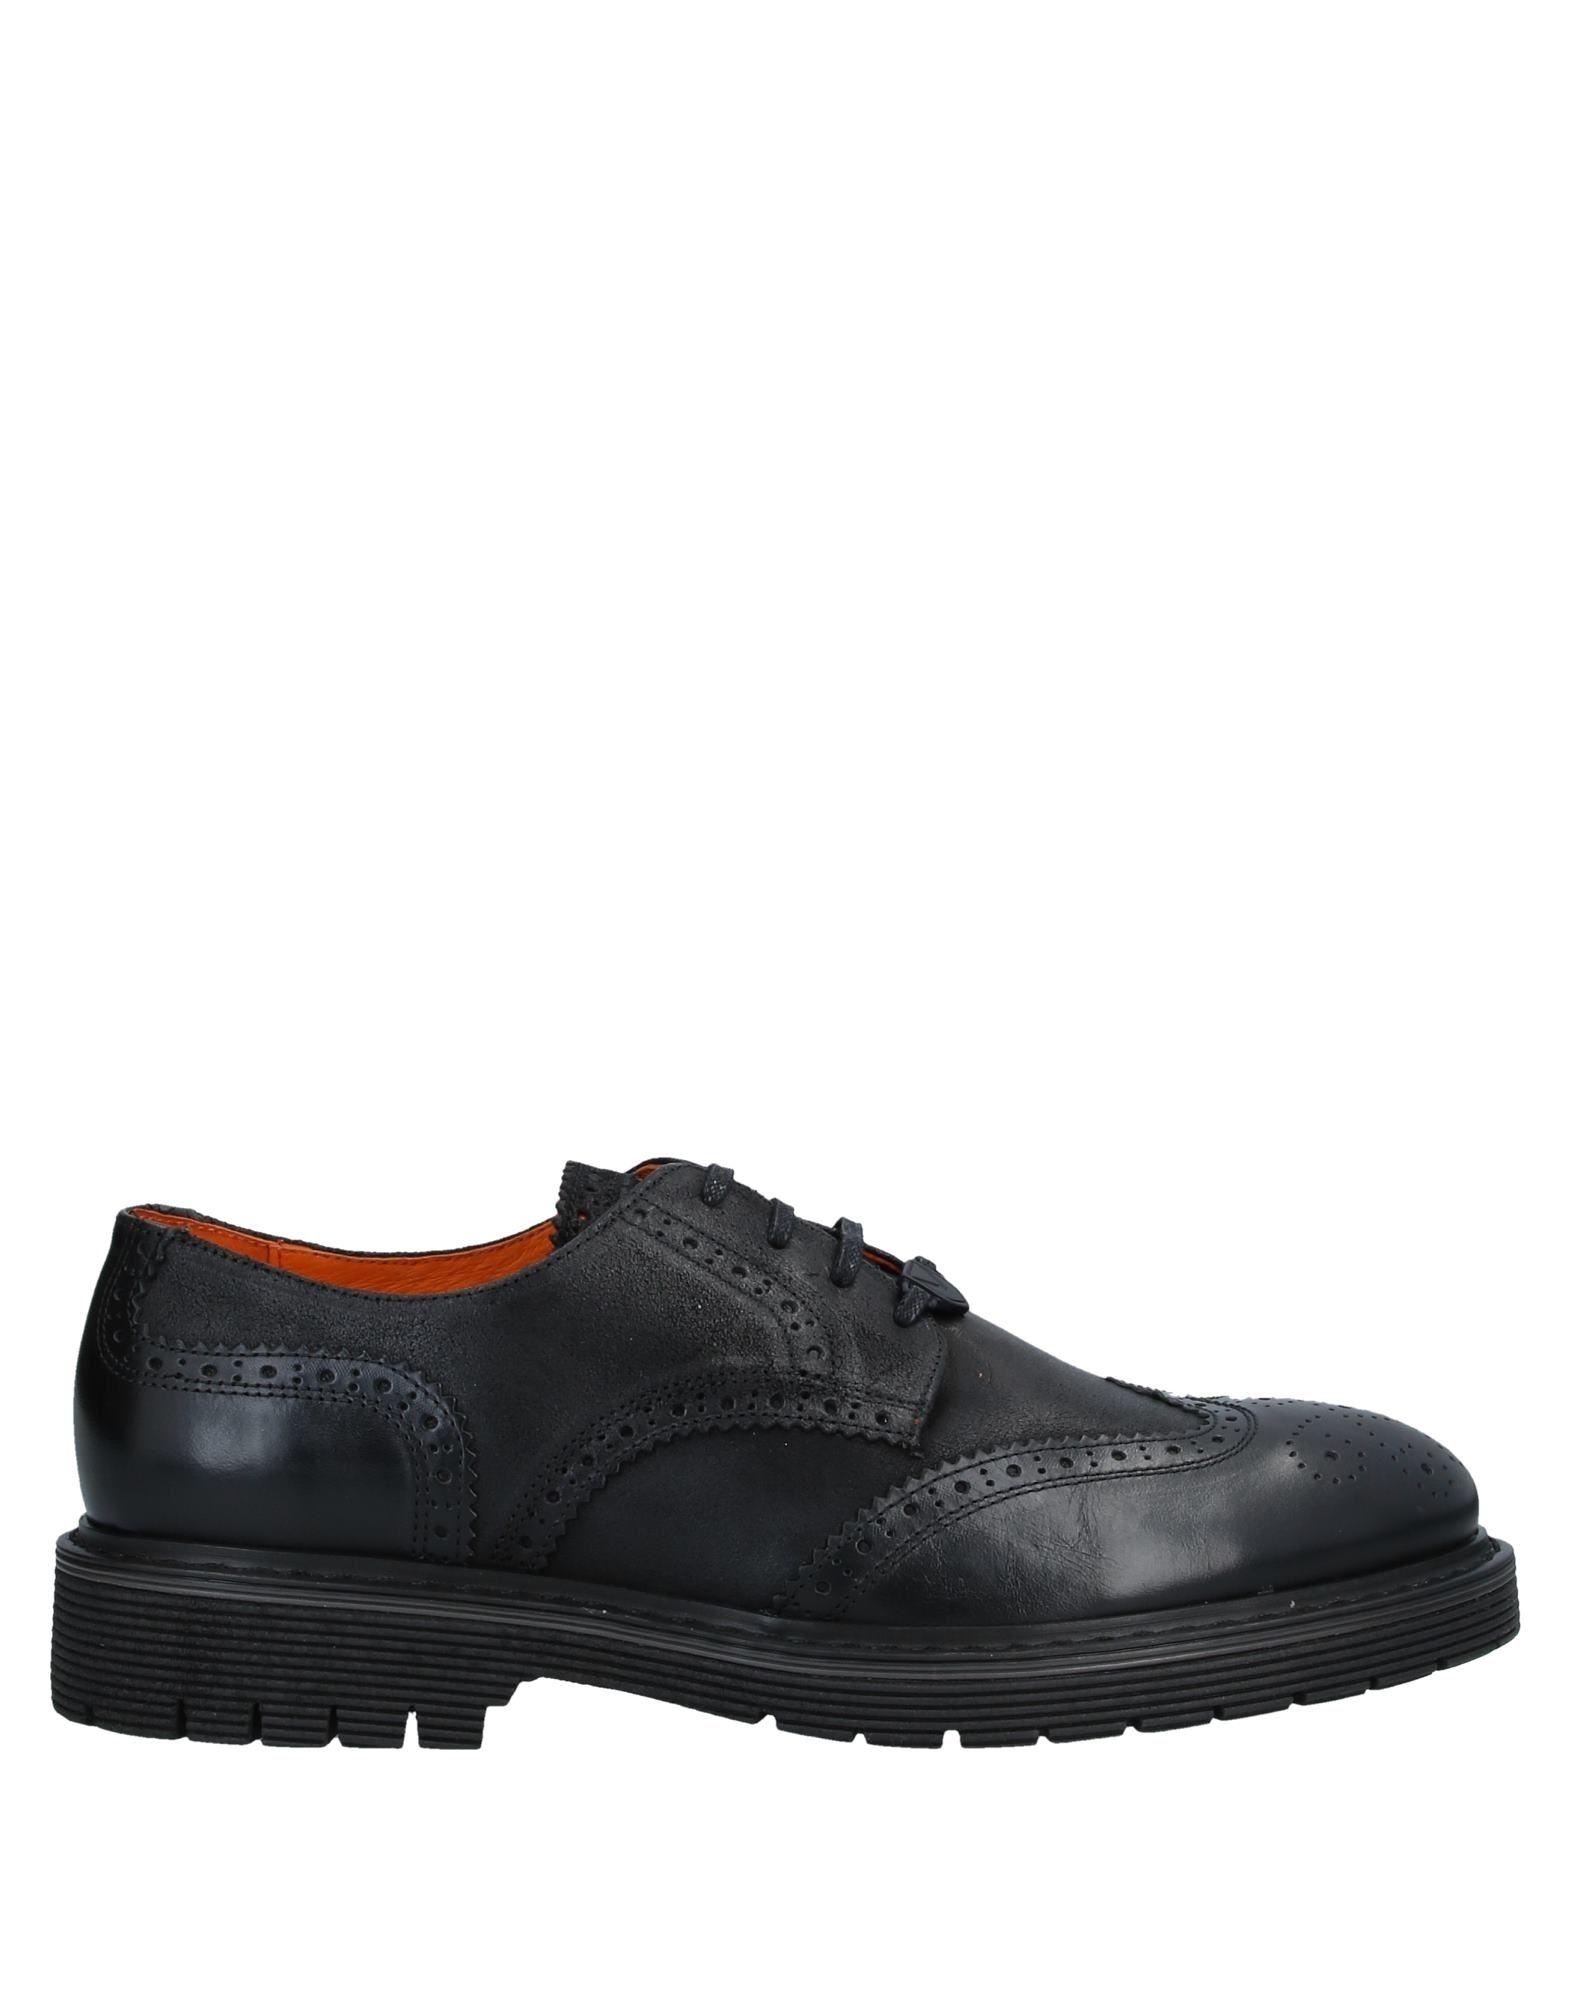 Chaussures À Lacets Kammi Homme - Chaussures À Lacets Kammi   - 11746986UG